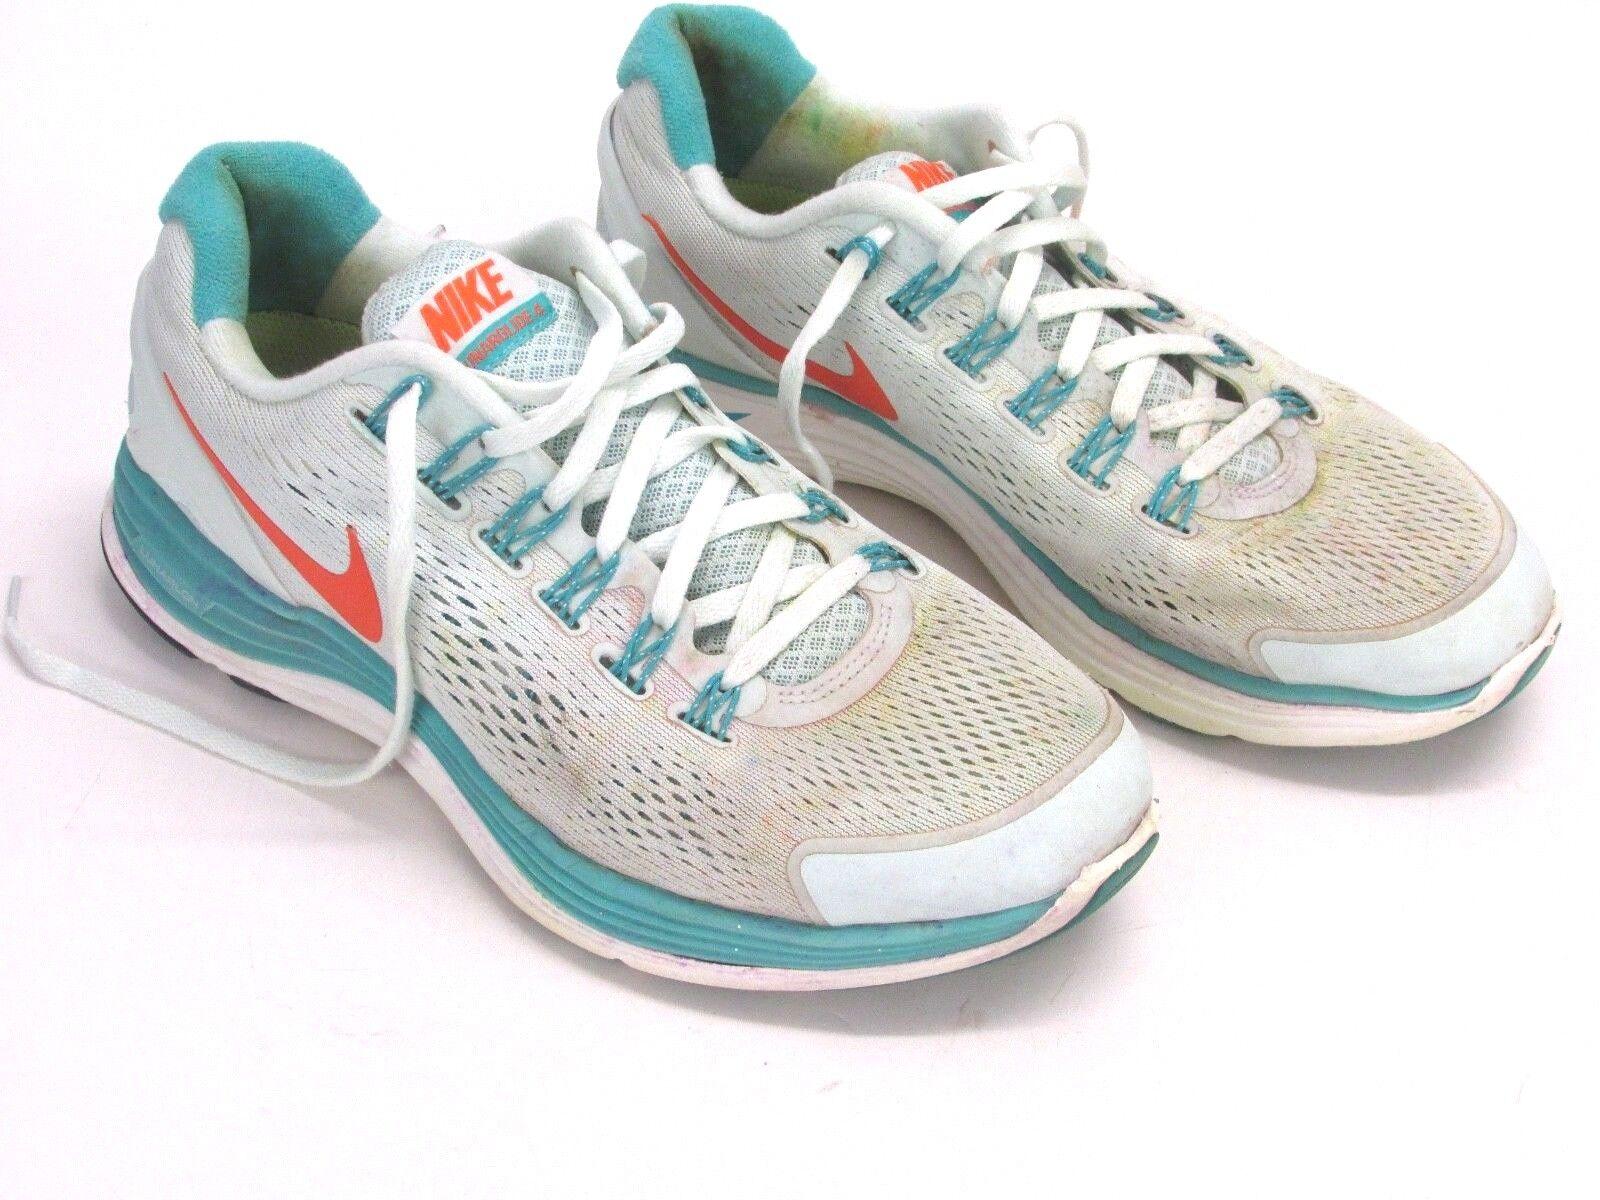 nike da donna lunarglide 4 scarpe da corsa, till till till & orange, dimensioni: 10,5 | Qualità Primacy  | Una Grande Varietà Di Merci  | Uomo/Donna Scarpa  b704b9